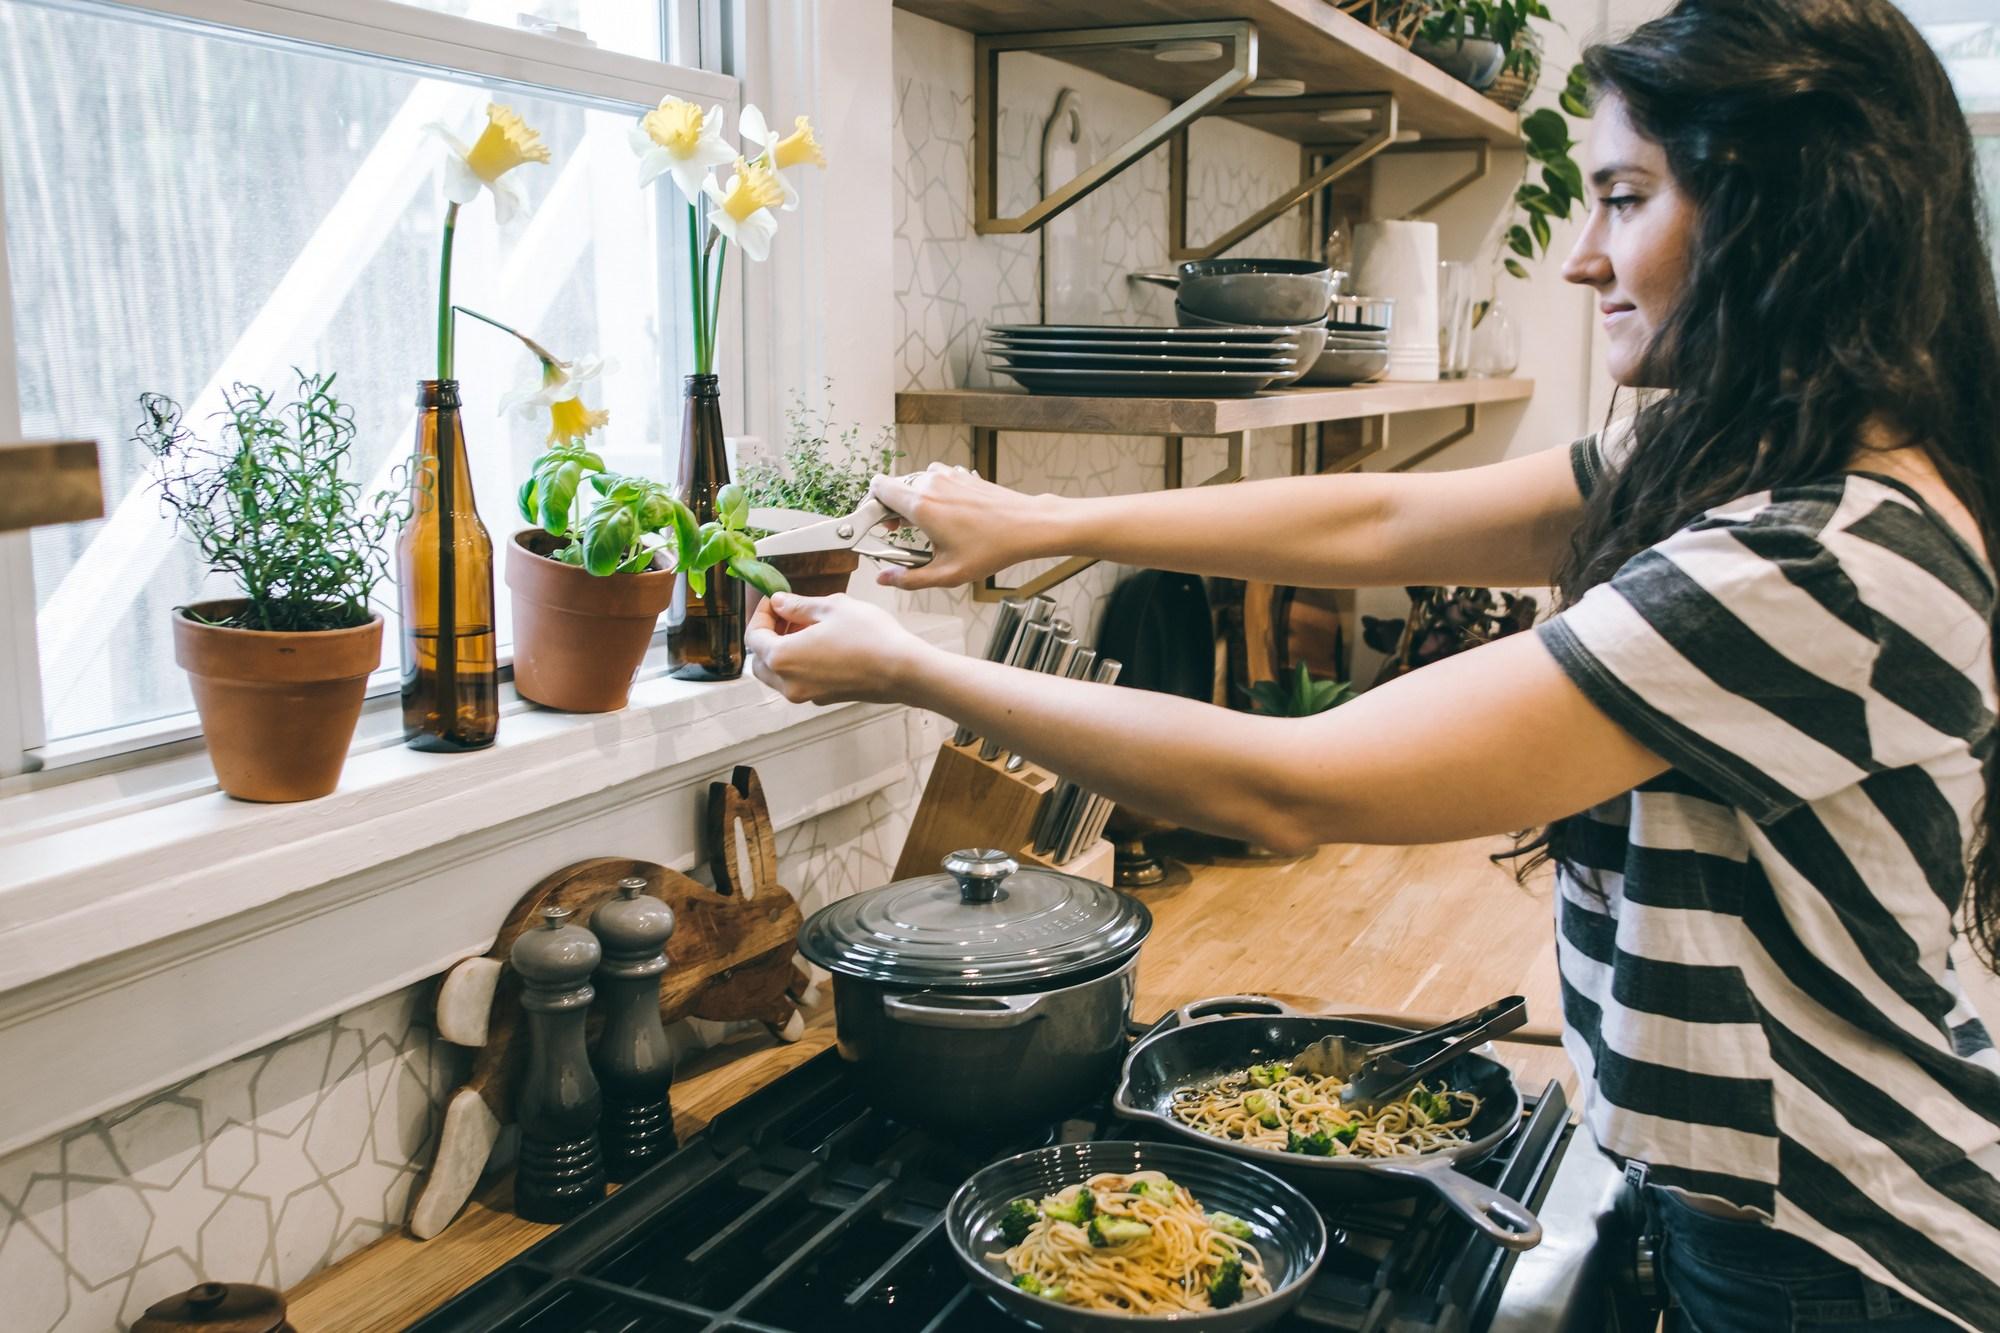 Nutrition advice healthy diet vegan